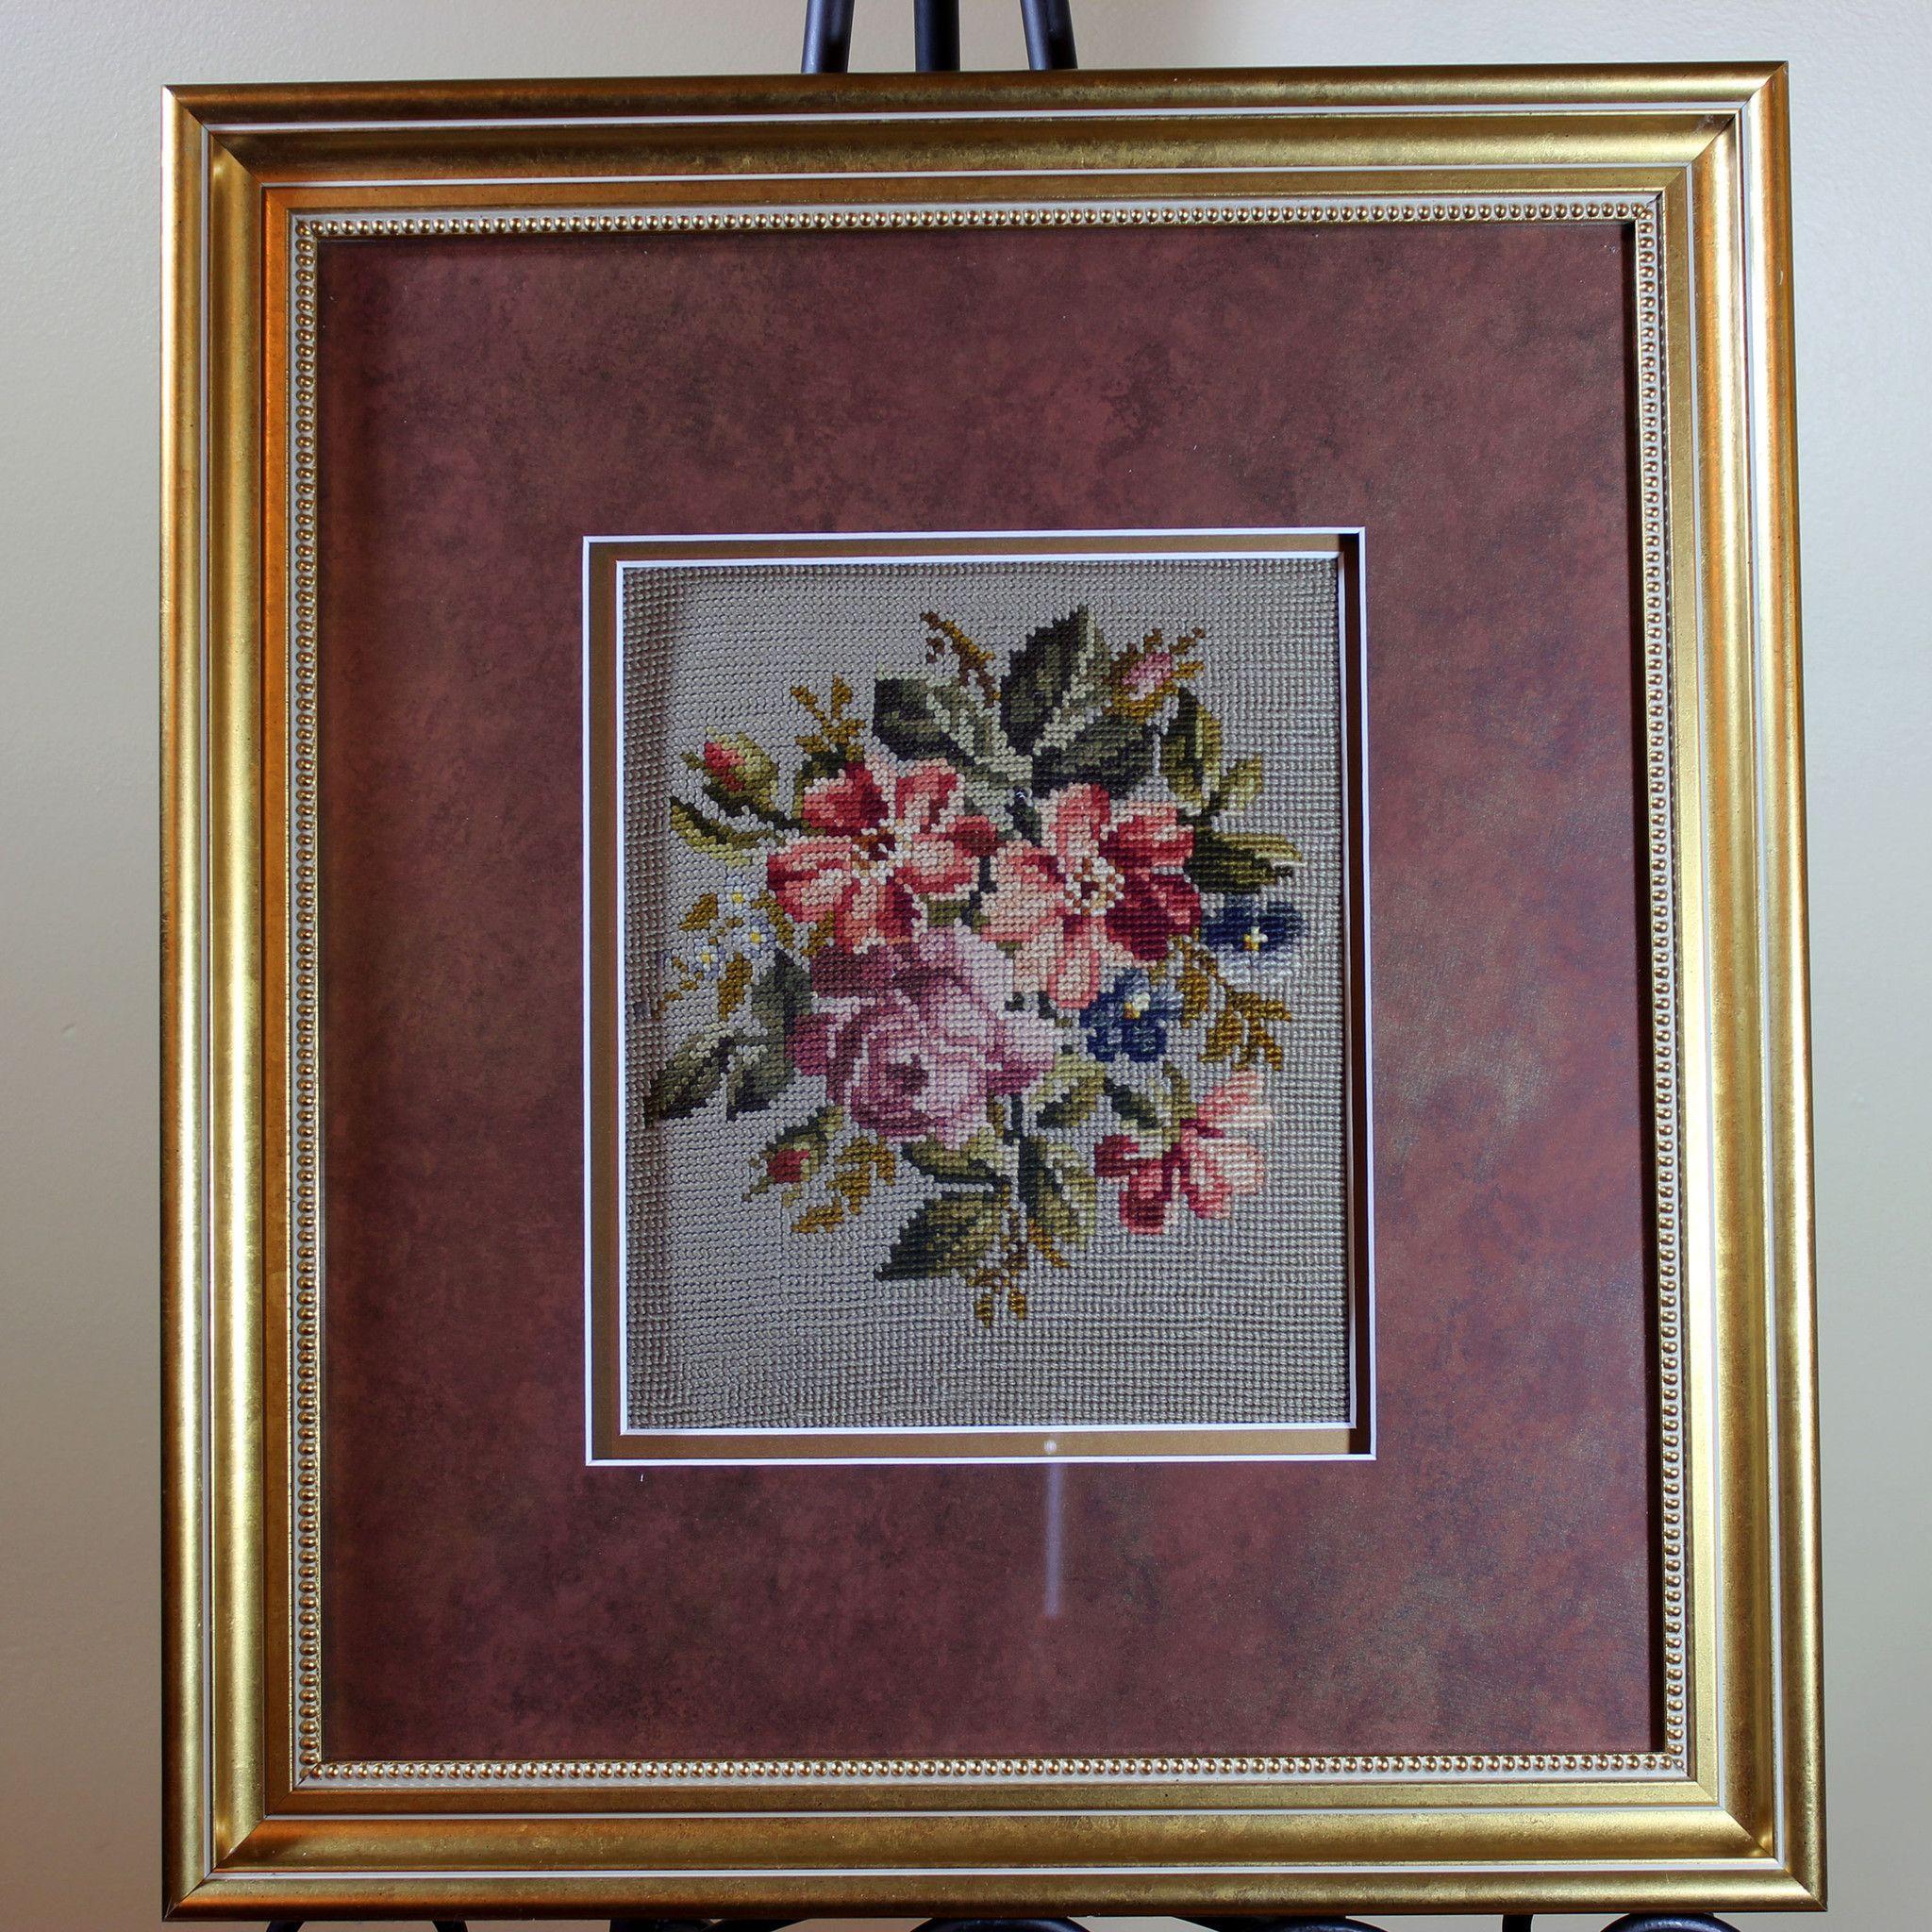 Needlepoint, Frame, Floral